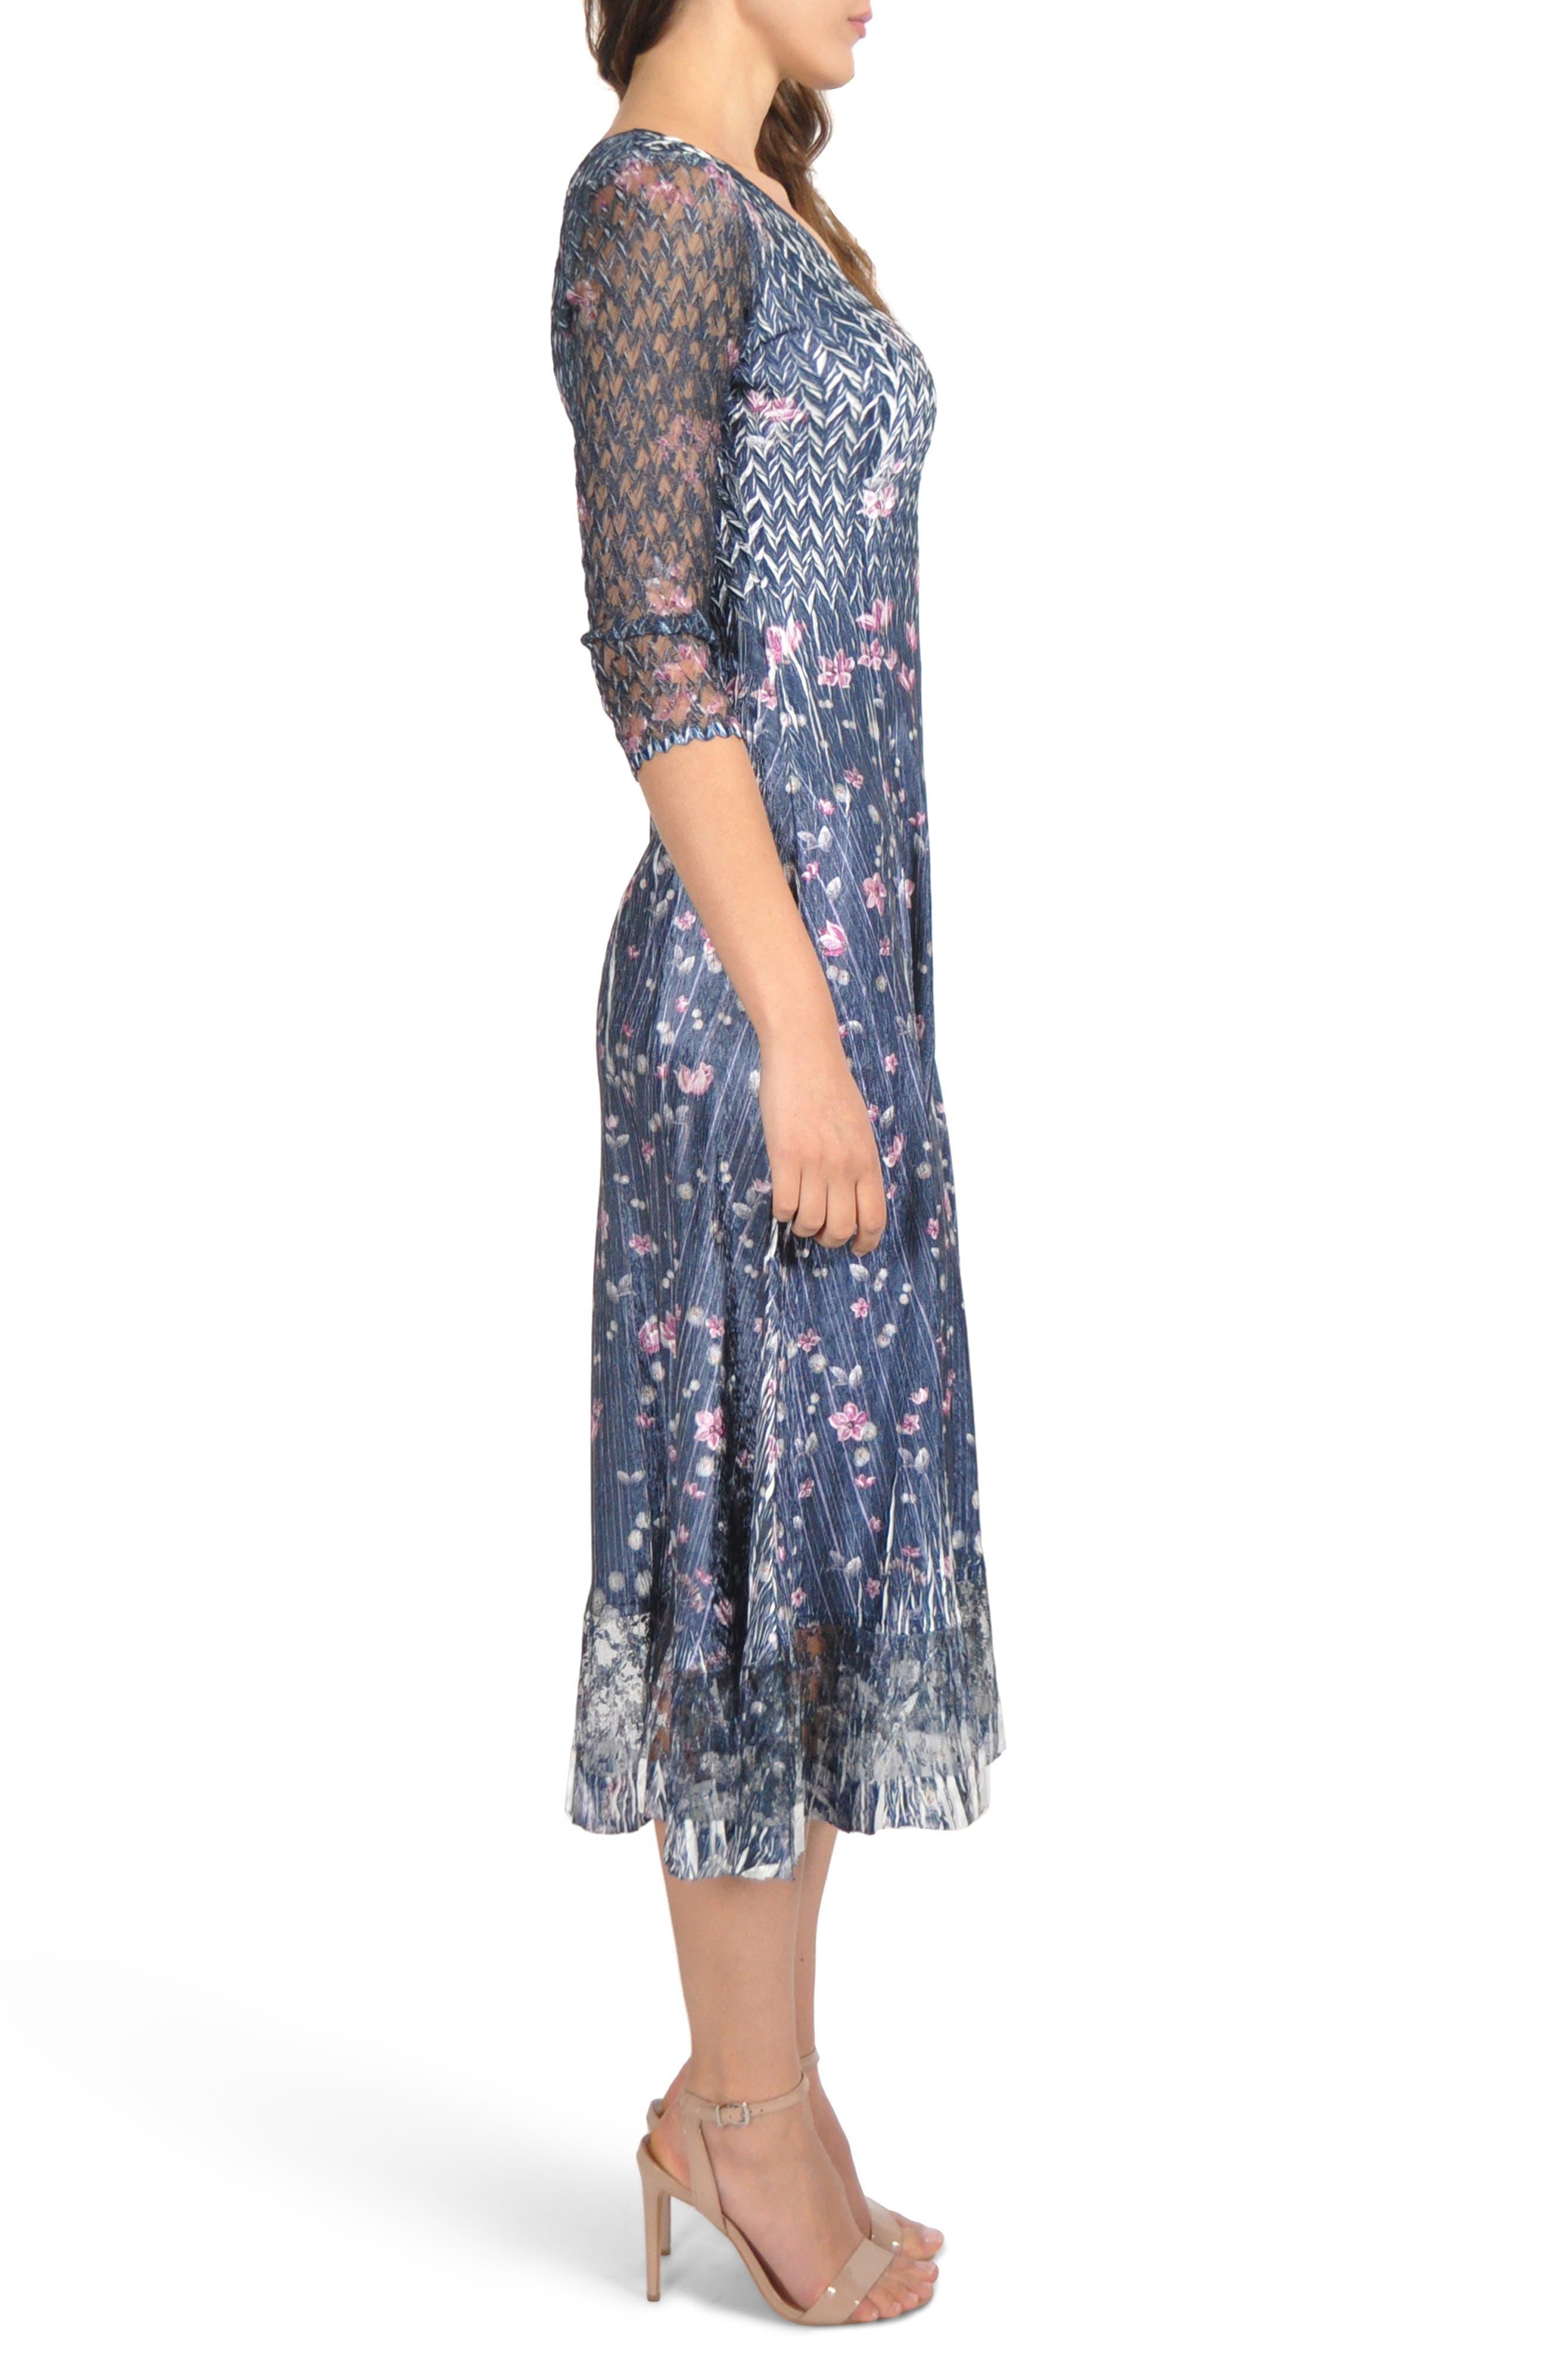 KOMAROV, Lace Sleeve Charmeuse Midi Dress, Alternate thumbnail 3, color, WILD THISTLE